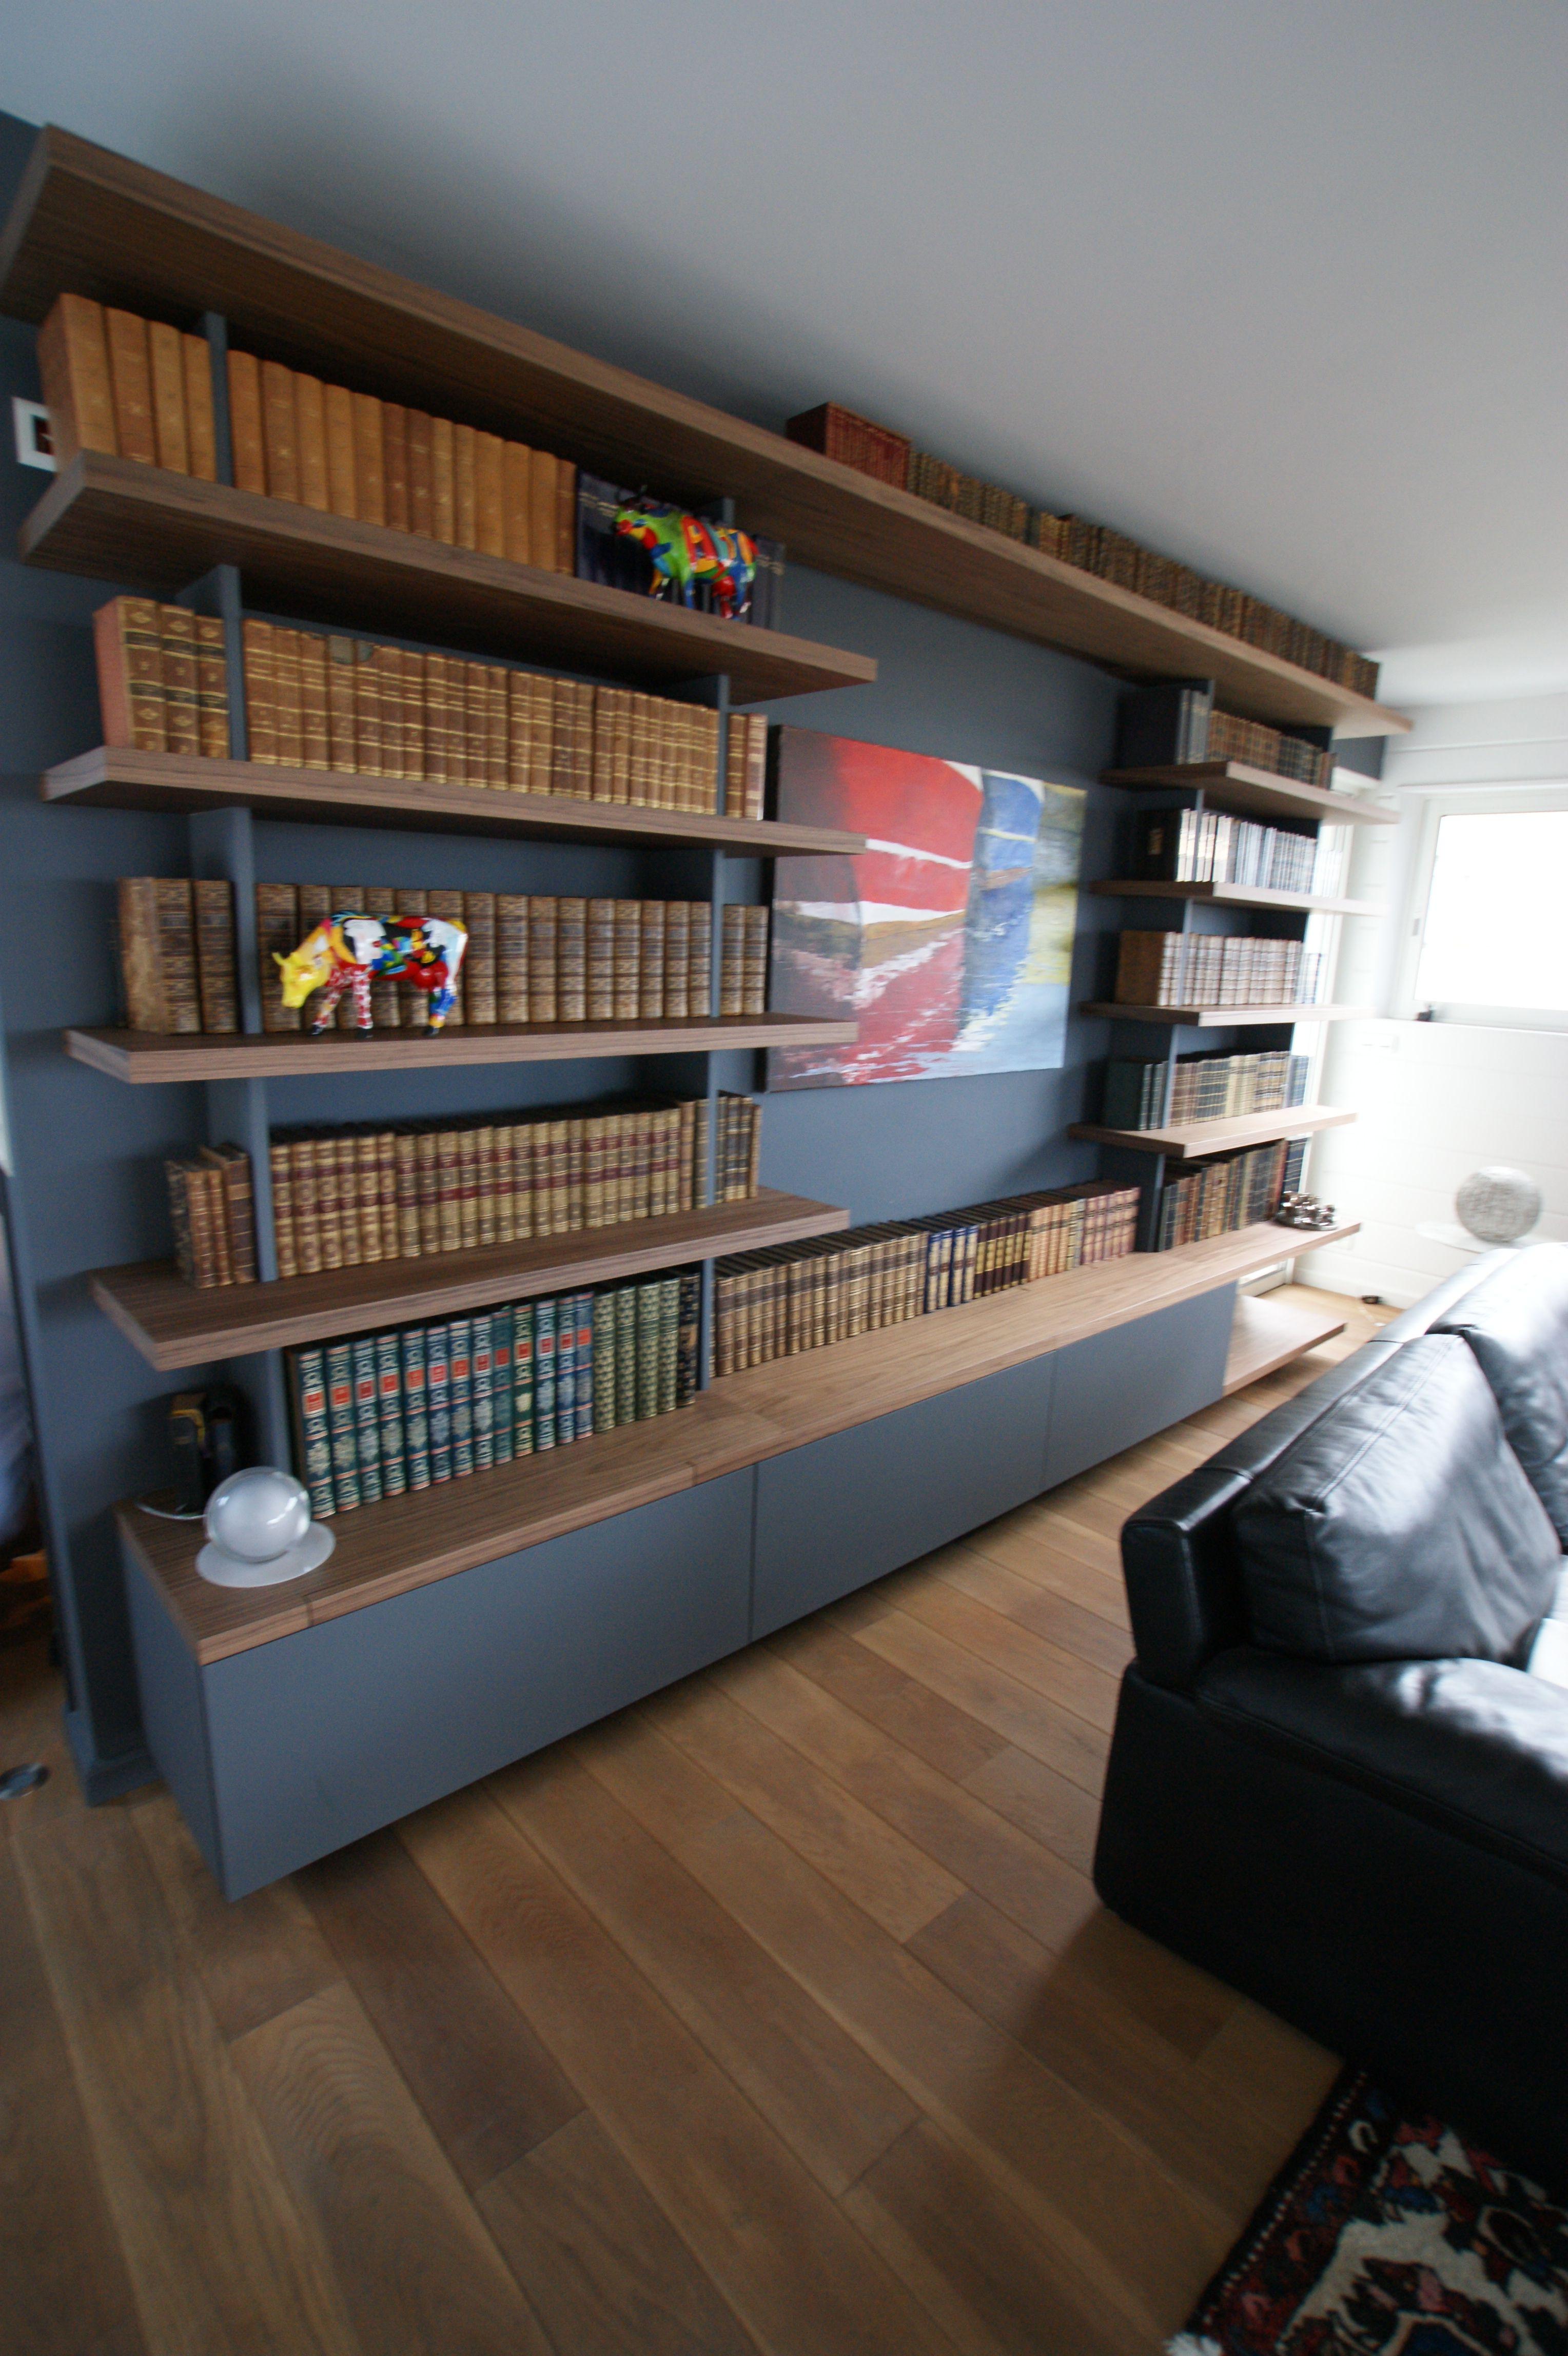 Bibliotheque Noyer Vernis Mdf Laque Bibliotheque Bois Wood Contemporain Mur Mobilier Sur Mesure Mobilier Bibliotheque